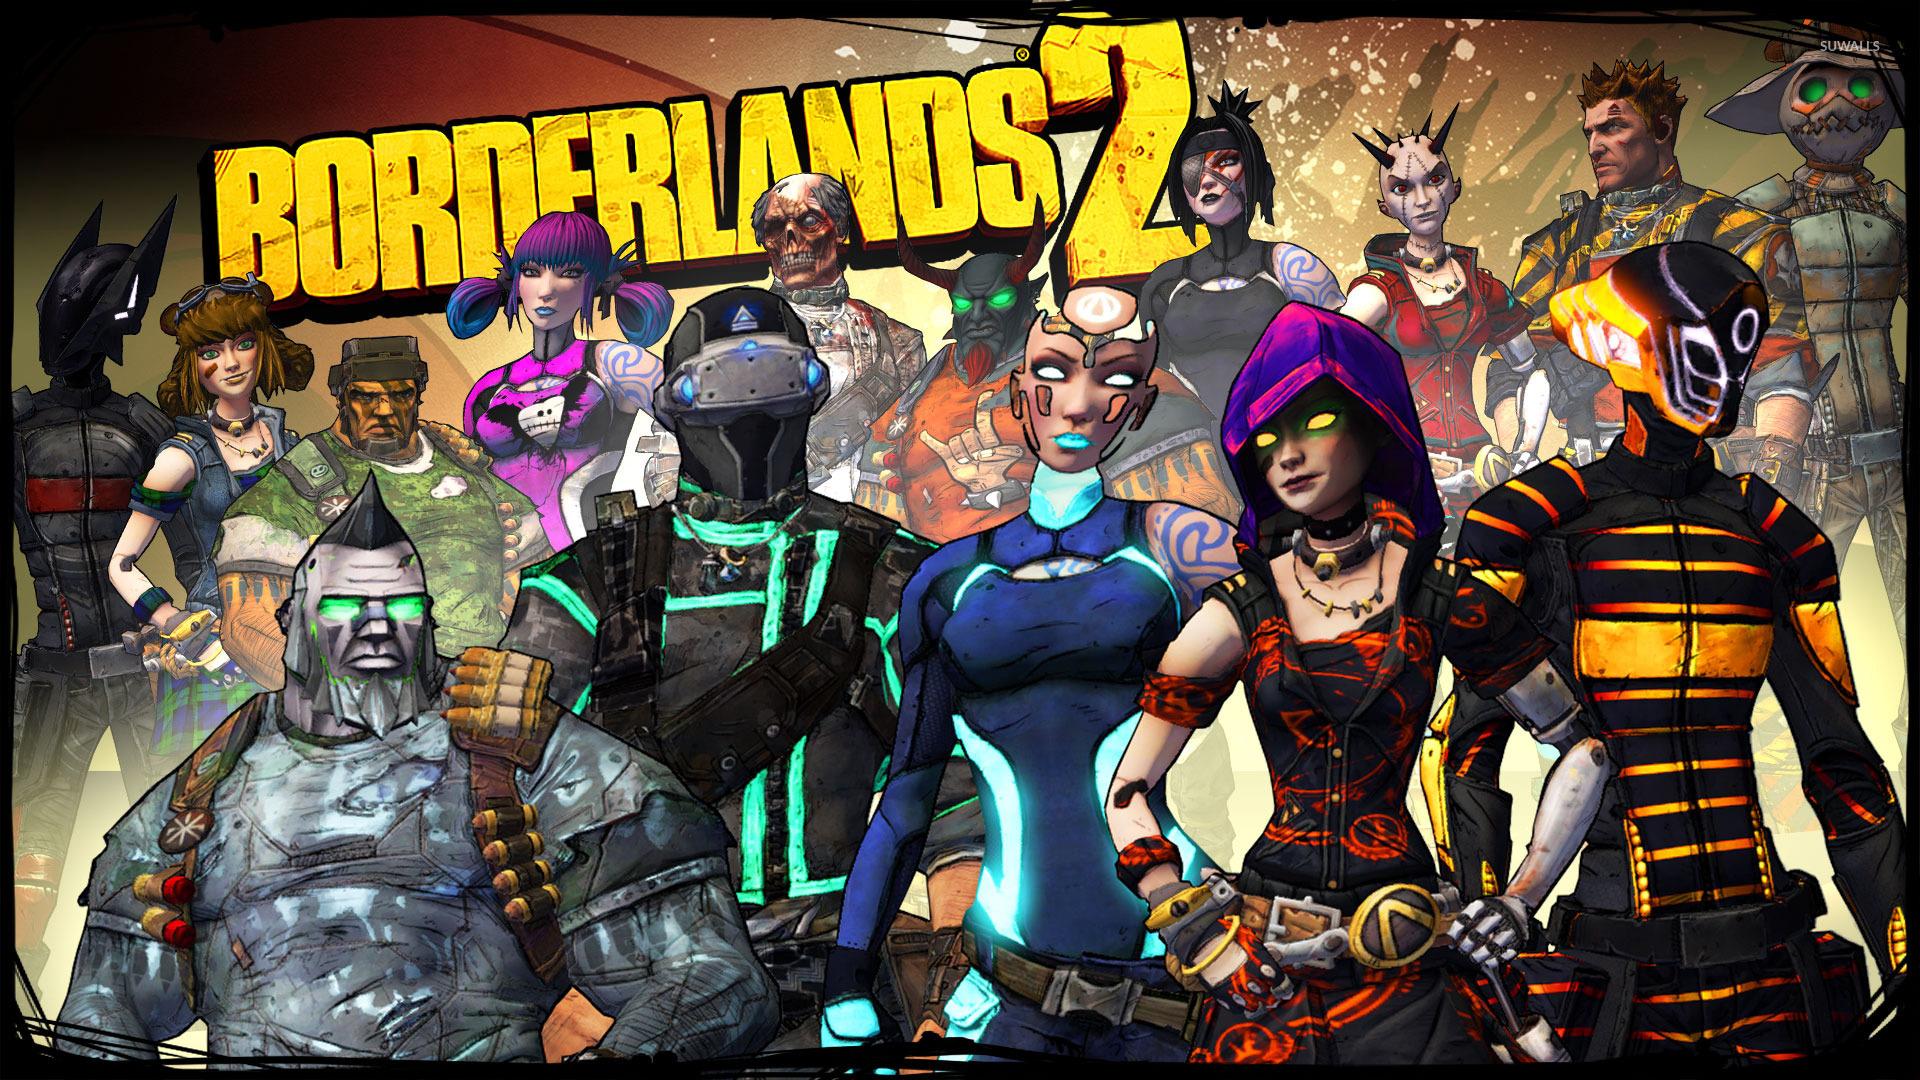 Borderlands 2 4 Wallpaper Game Wallpapers 23211